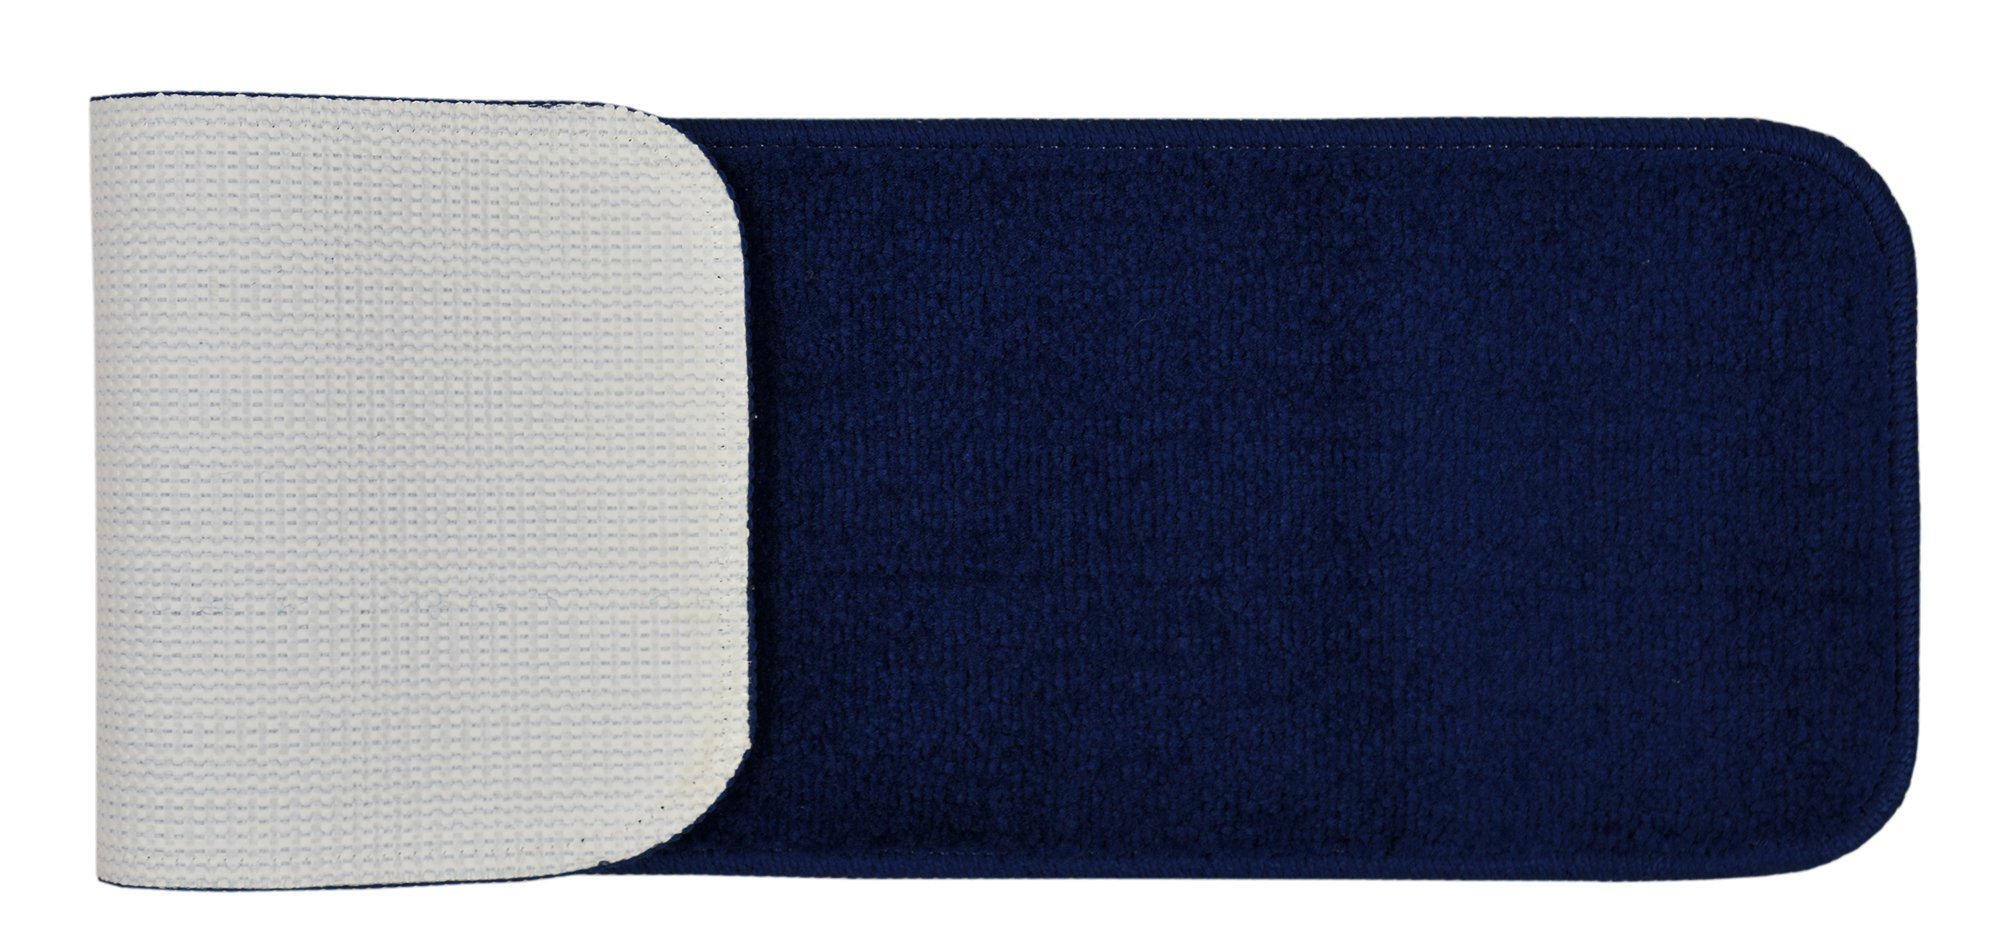 RugStylesOnline TRENDY-ST-8X30-NAVY-13 Trendy Stair Tread Treads Indoor Skid Slip Resistant Carpet Stair Tread Treads Machine Washable 8 ½'' W x 30'' L, Royal Navy Blue, Set of 13 by RugStylesOnline (Image #2)